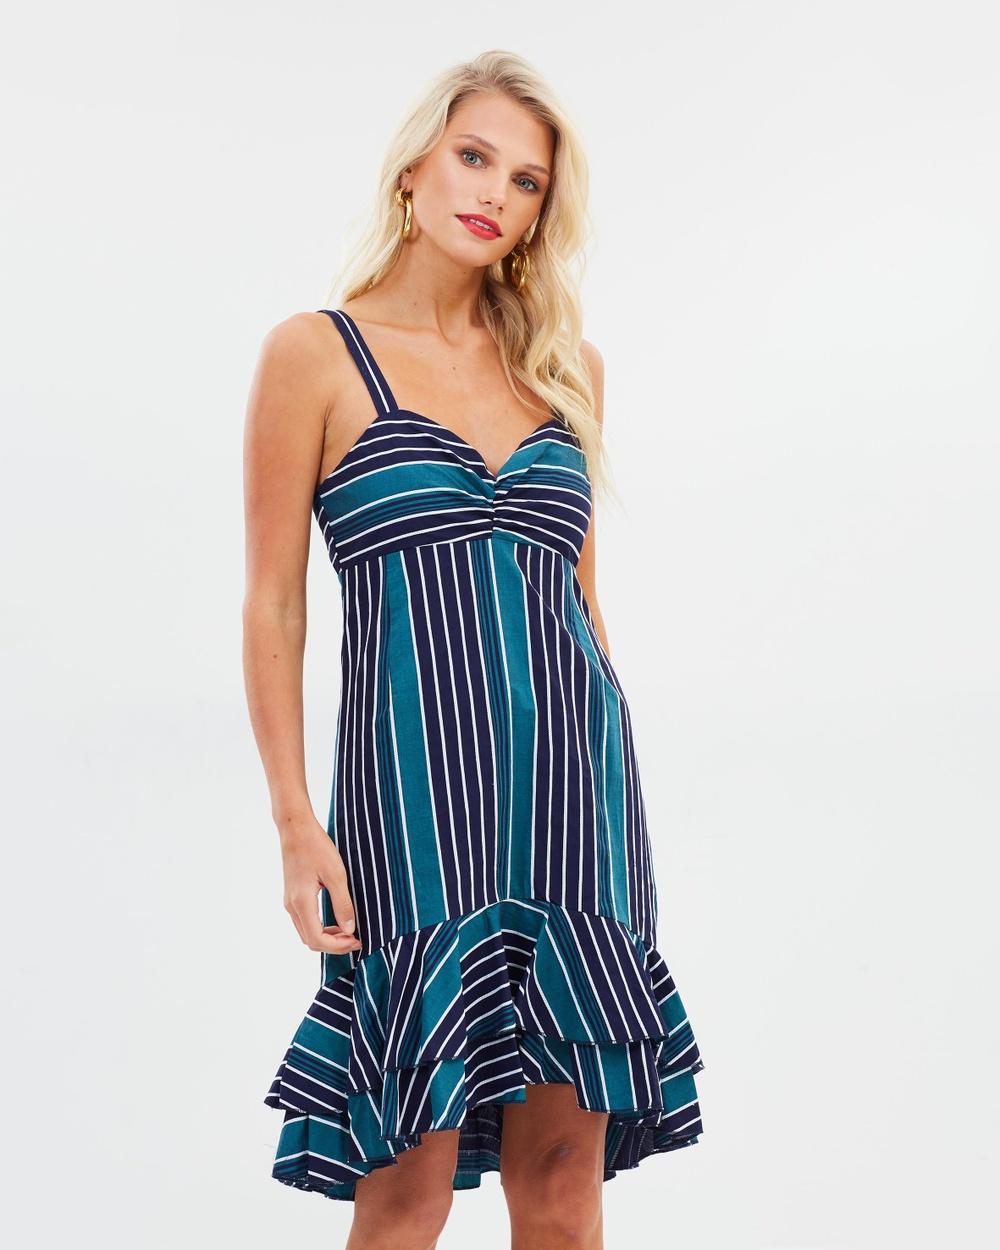 Atmos & Here Green Navy Stripe ICONIC EXCLUSIVE – Verona Ruffle Dress